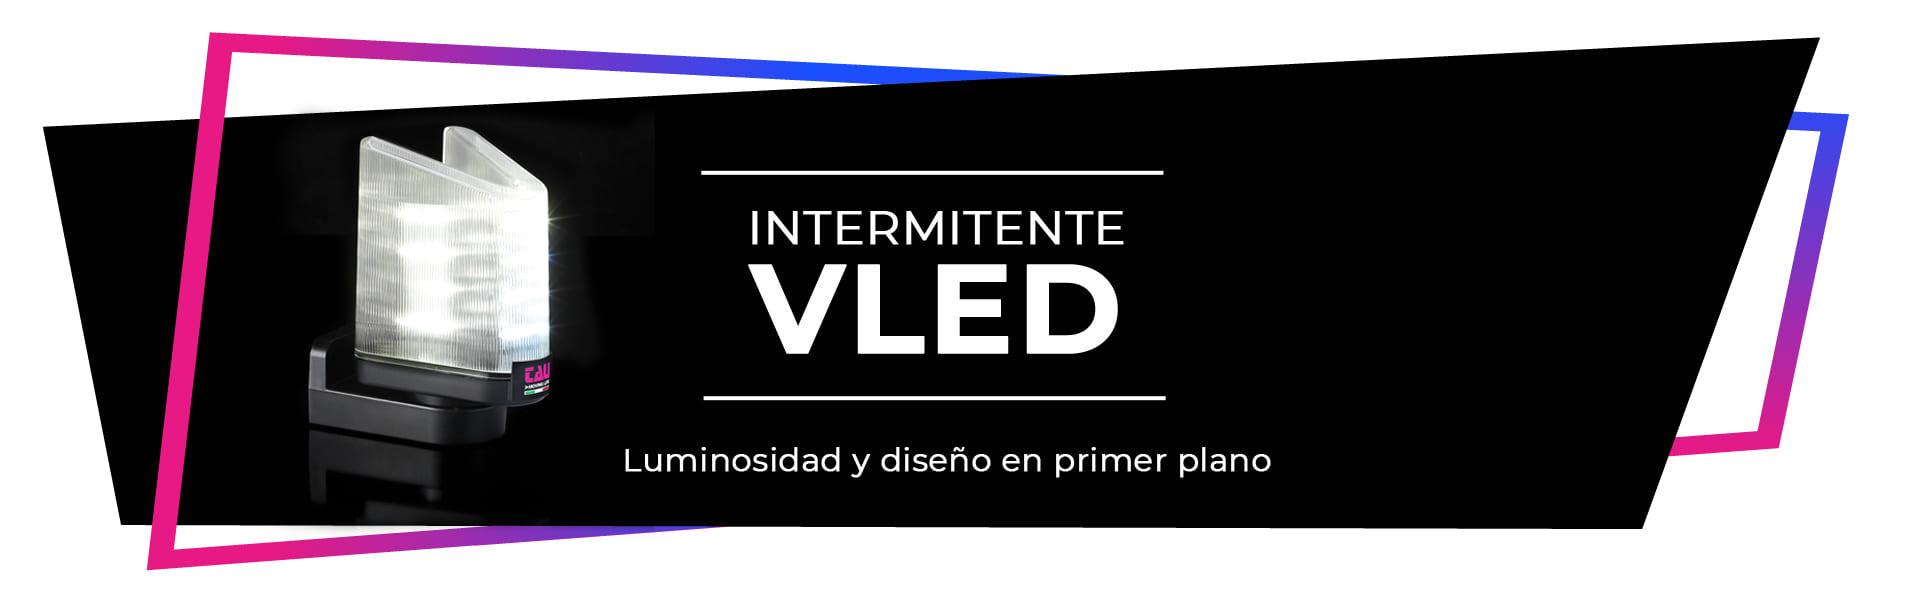 vled_carosello_ES (3)